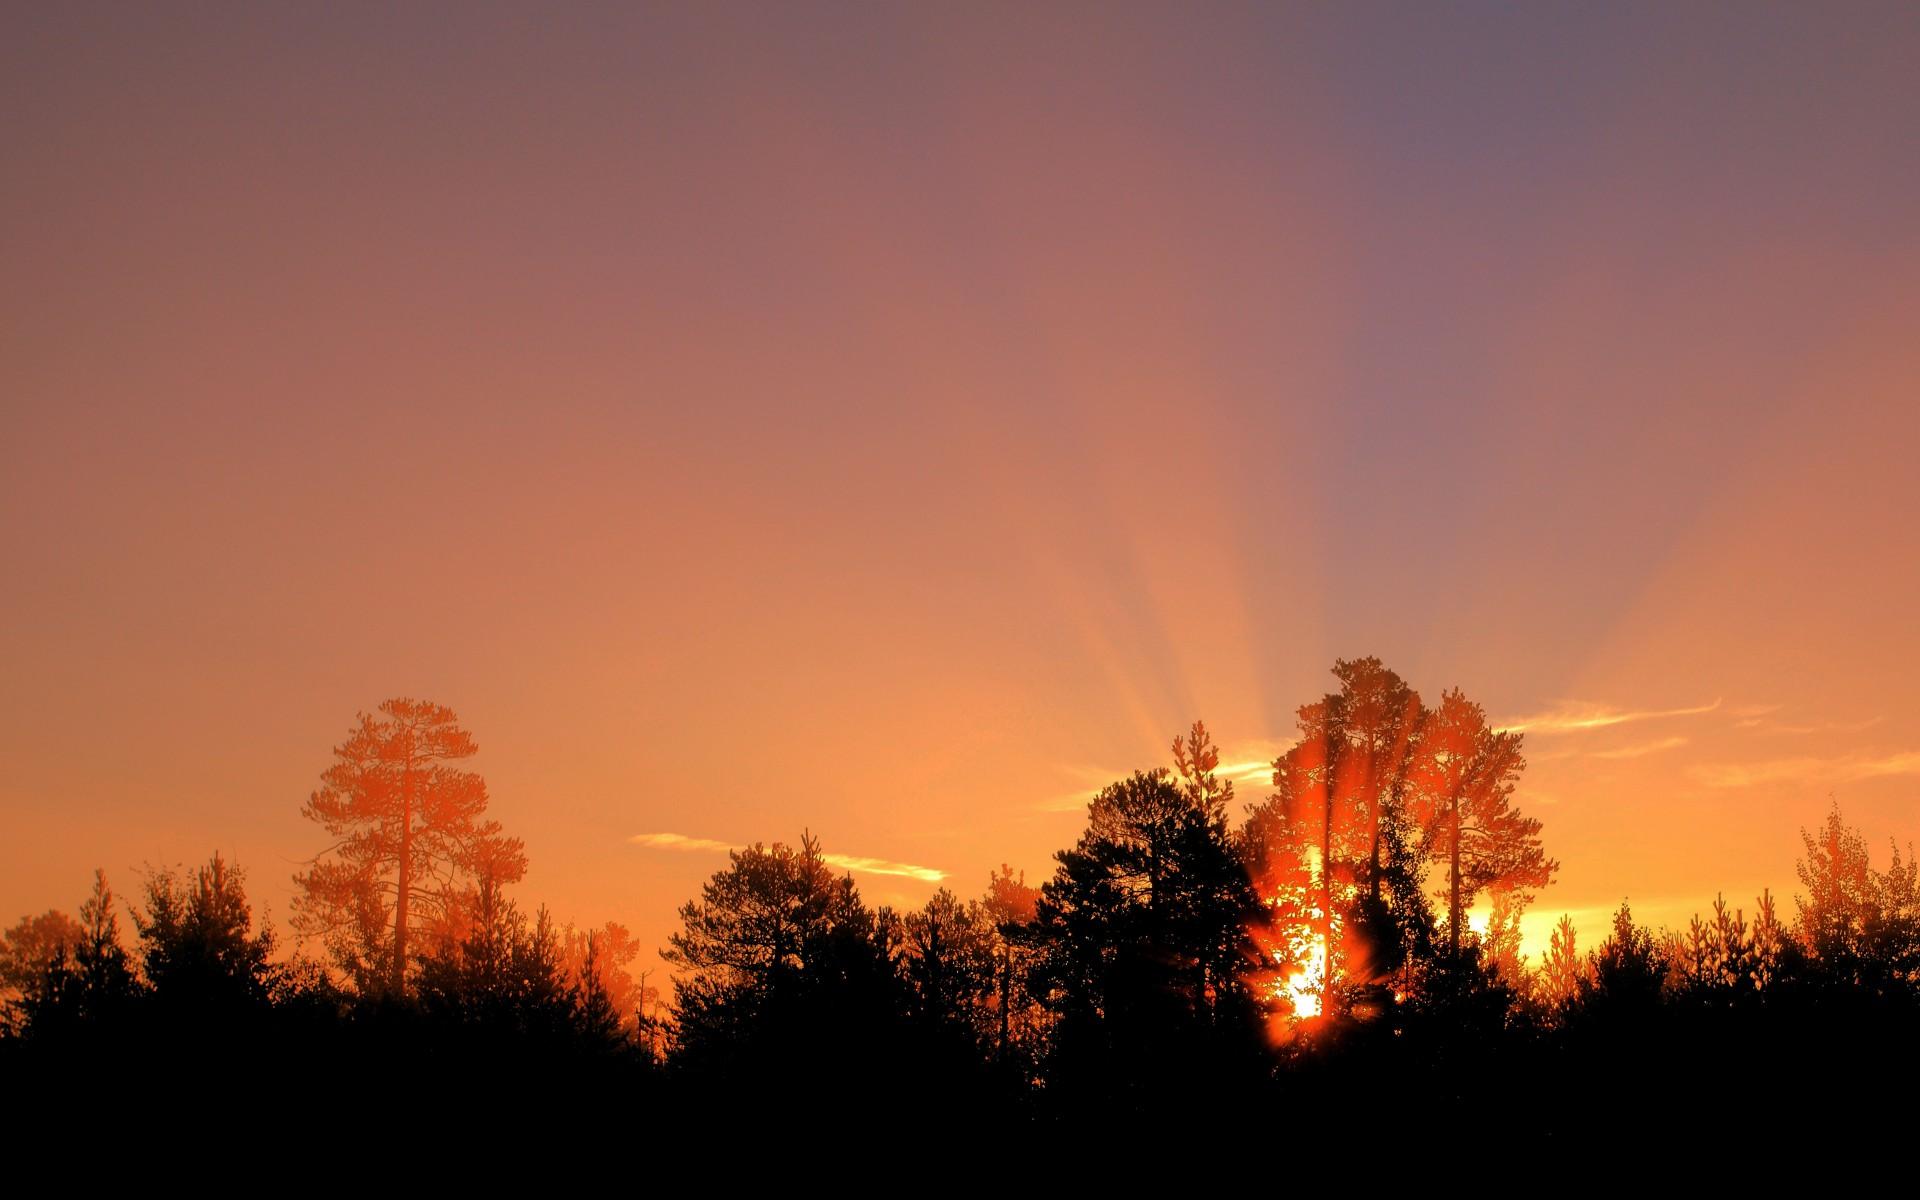 sunset scenery silhouette